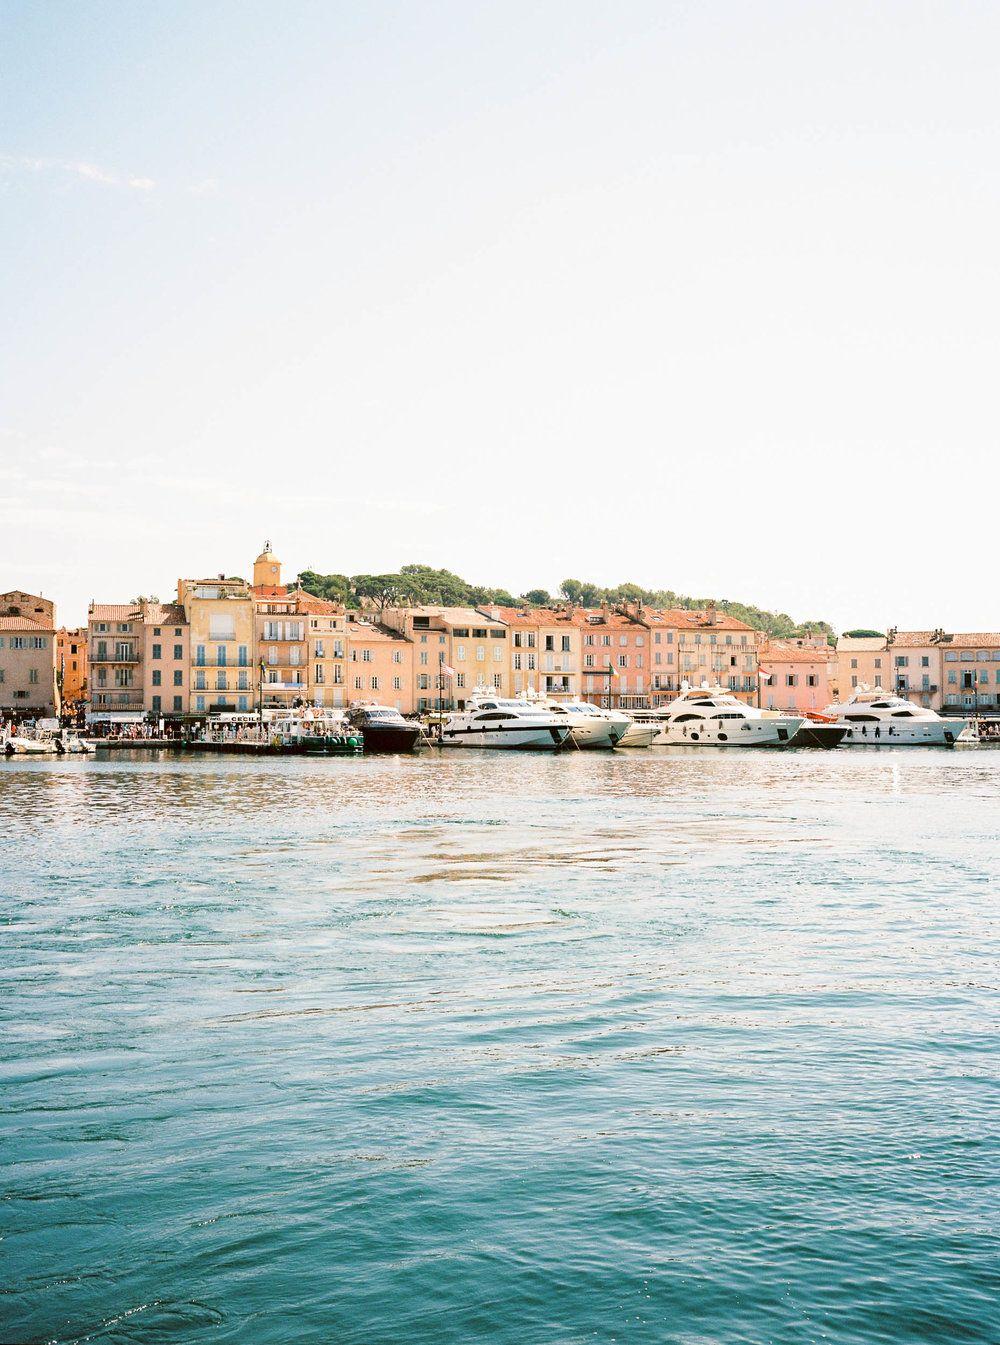 Yacht wedding decoration ideas  Amy OuBoyle Photography South Of France St Tropez Yacht Holiday